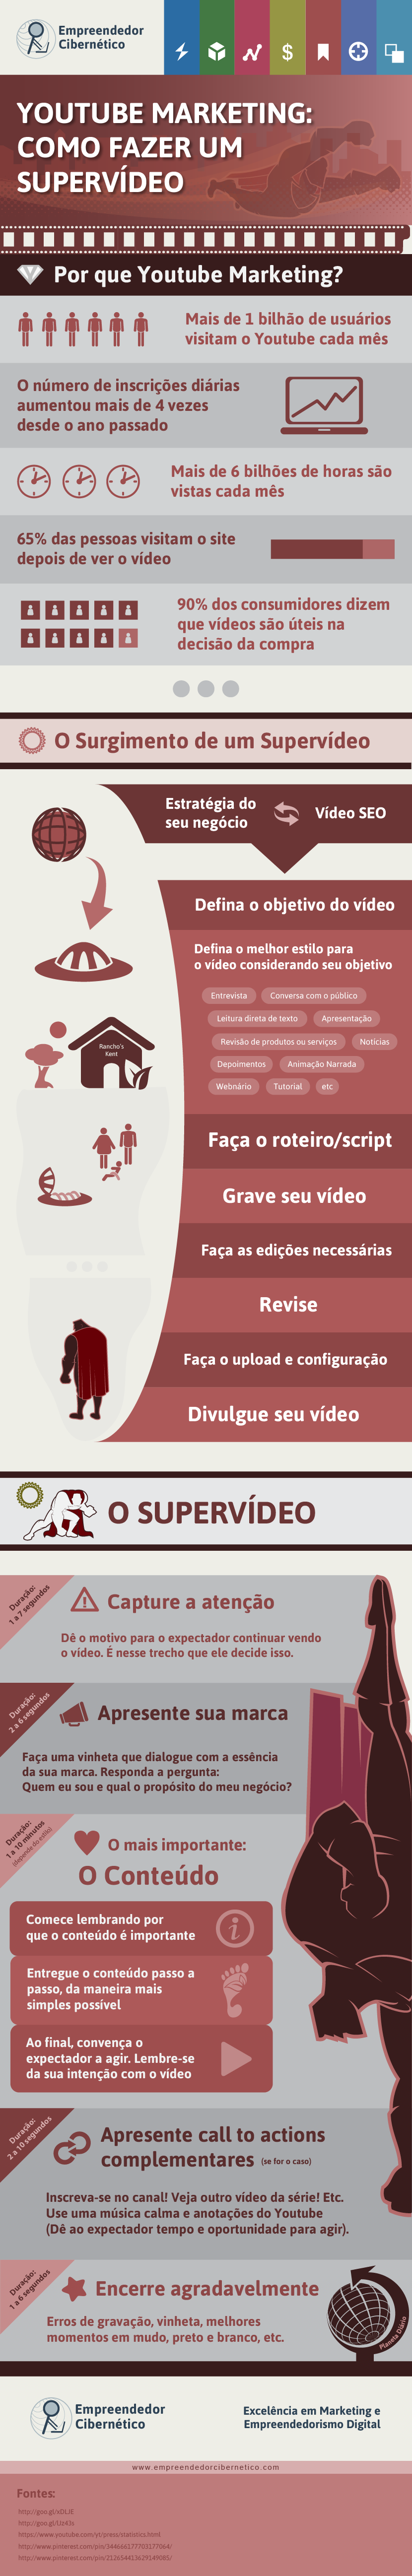 publicidade em vídeo online